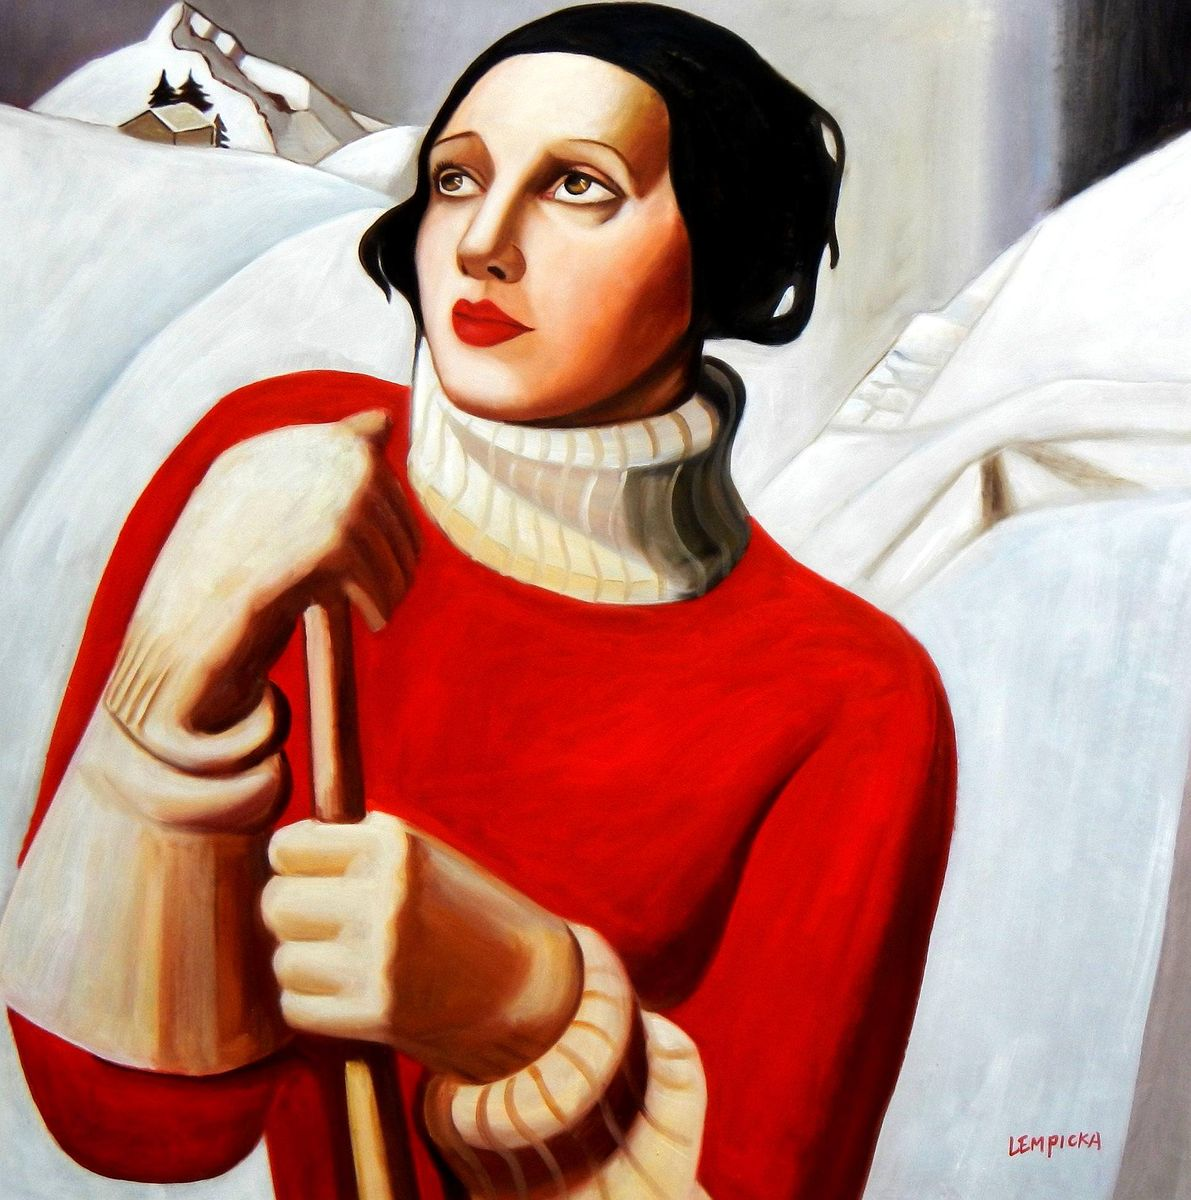 Homage to T. Lempicka - Sain Moritz m93150 120x120cm handgemaltes Gemälde